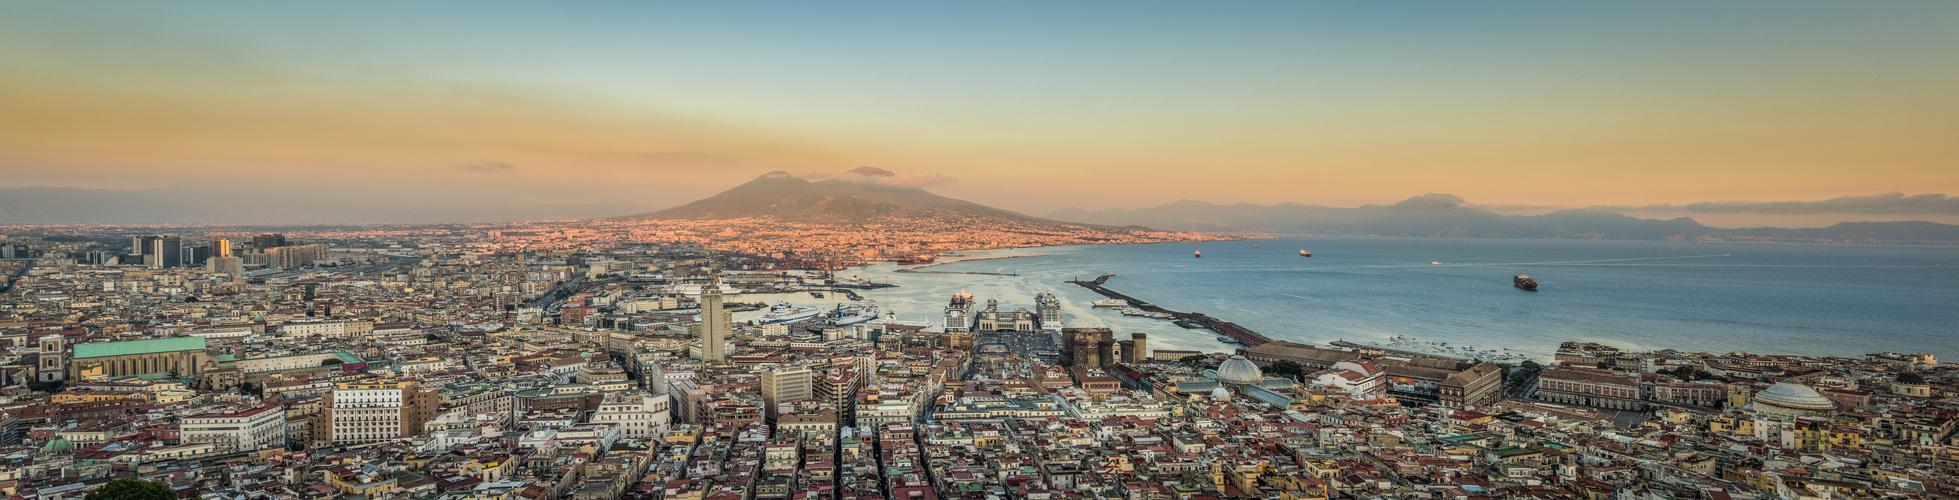 Blaue Stunde: Abends in Neapel